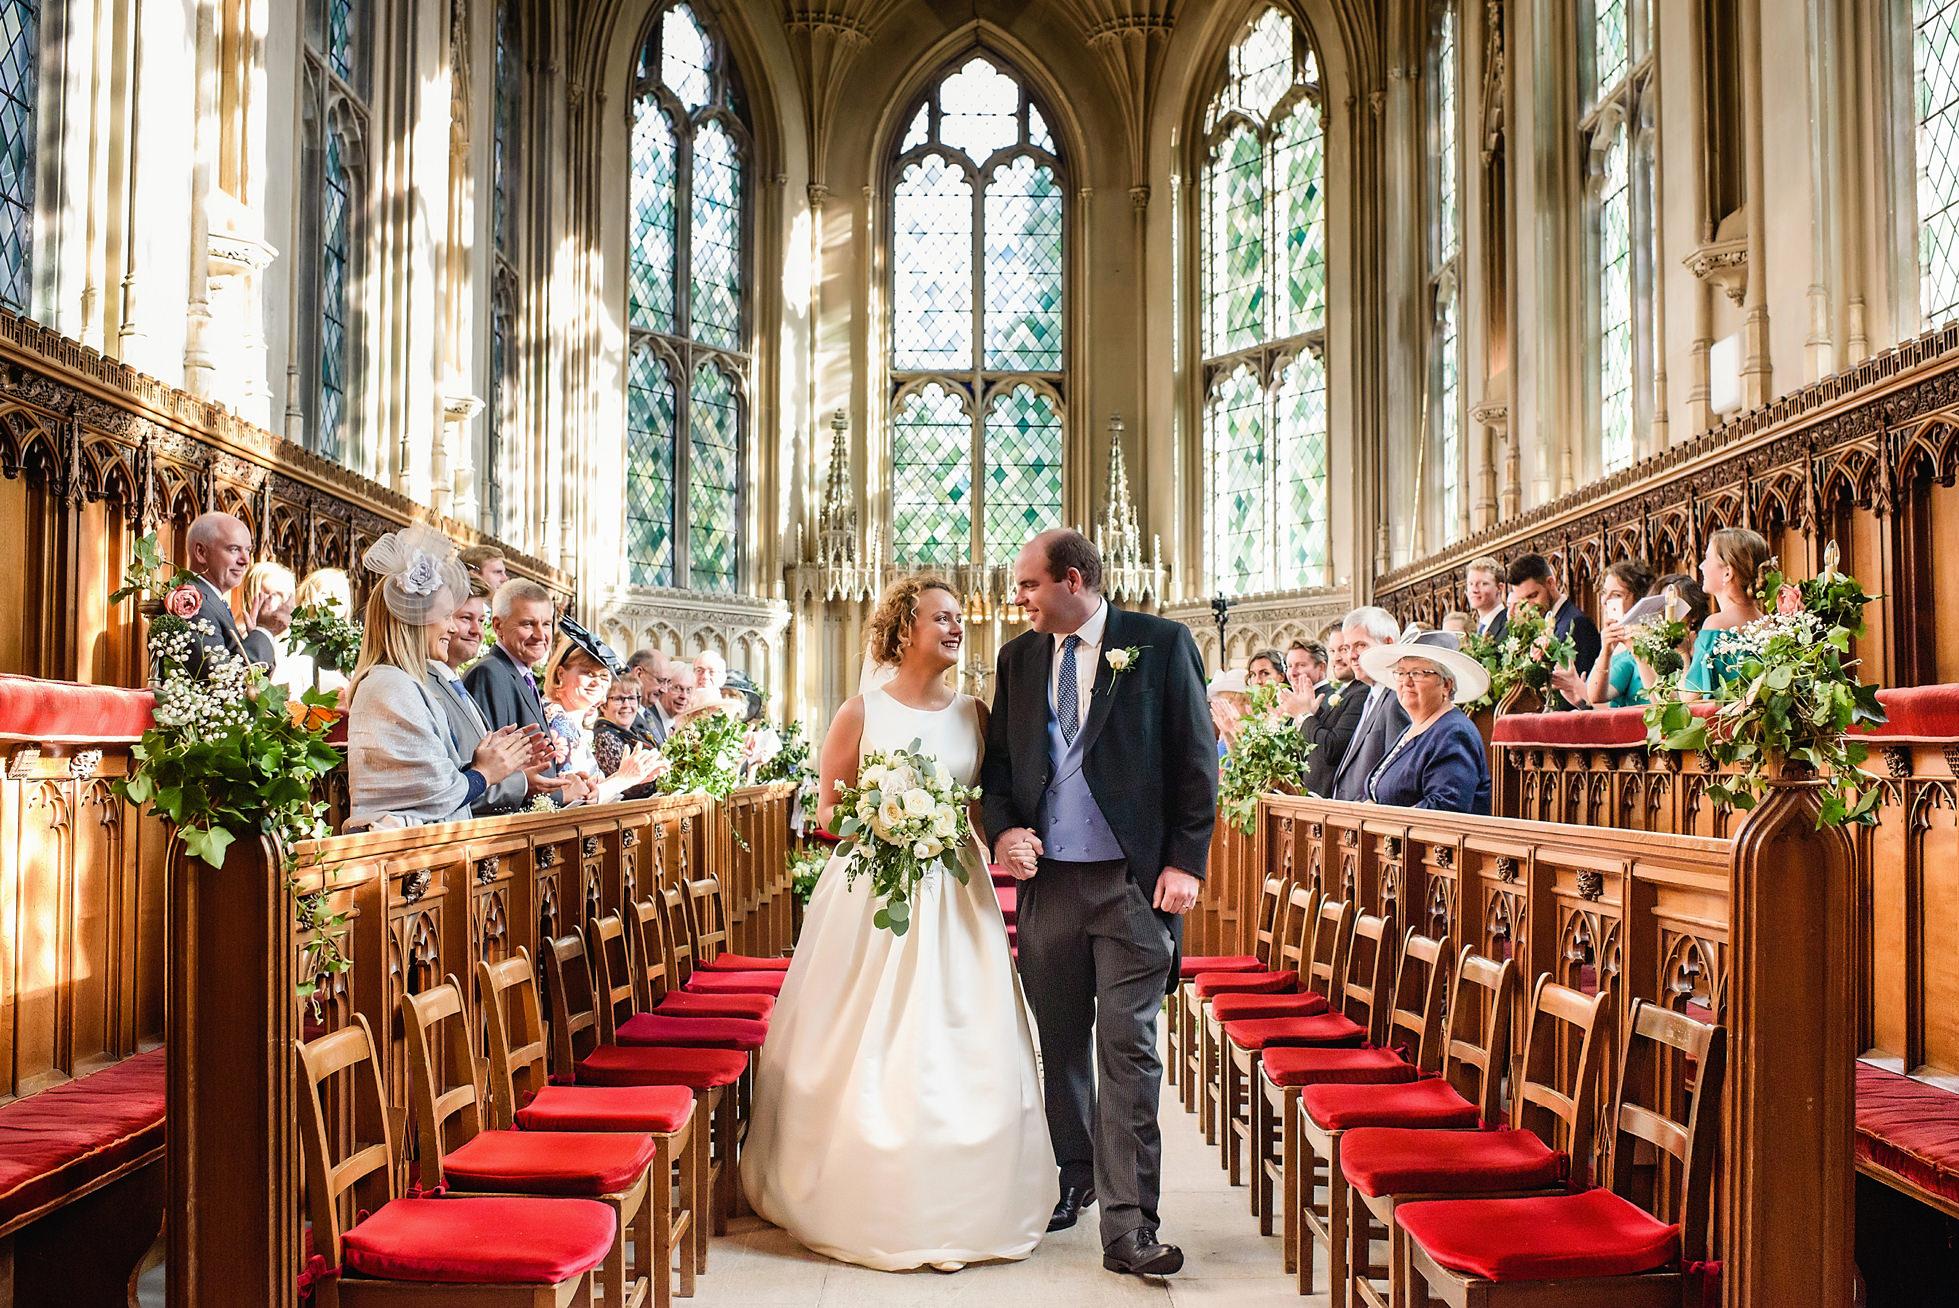 wedding ceremony in chapel at ashridge house